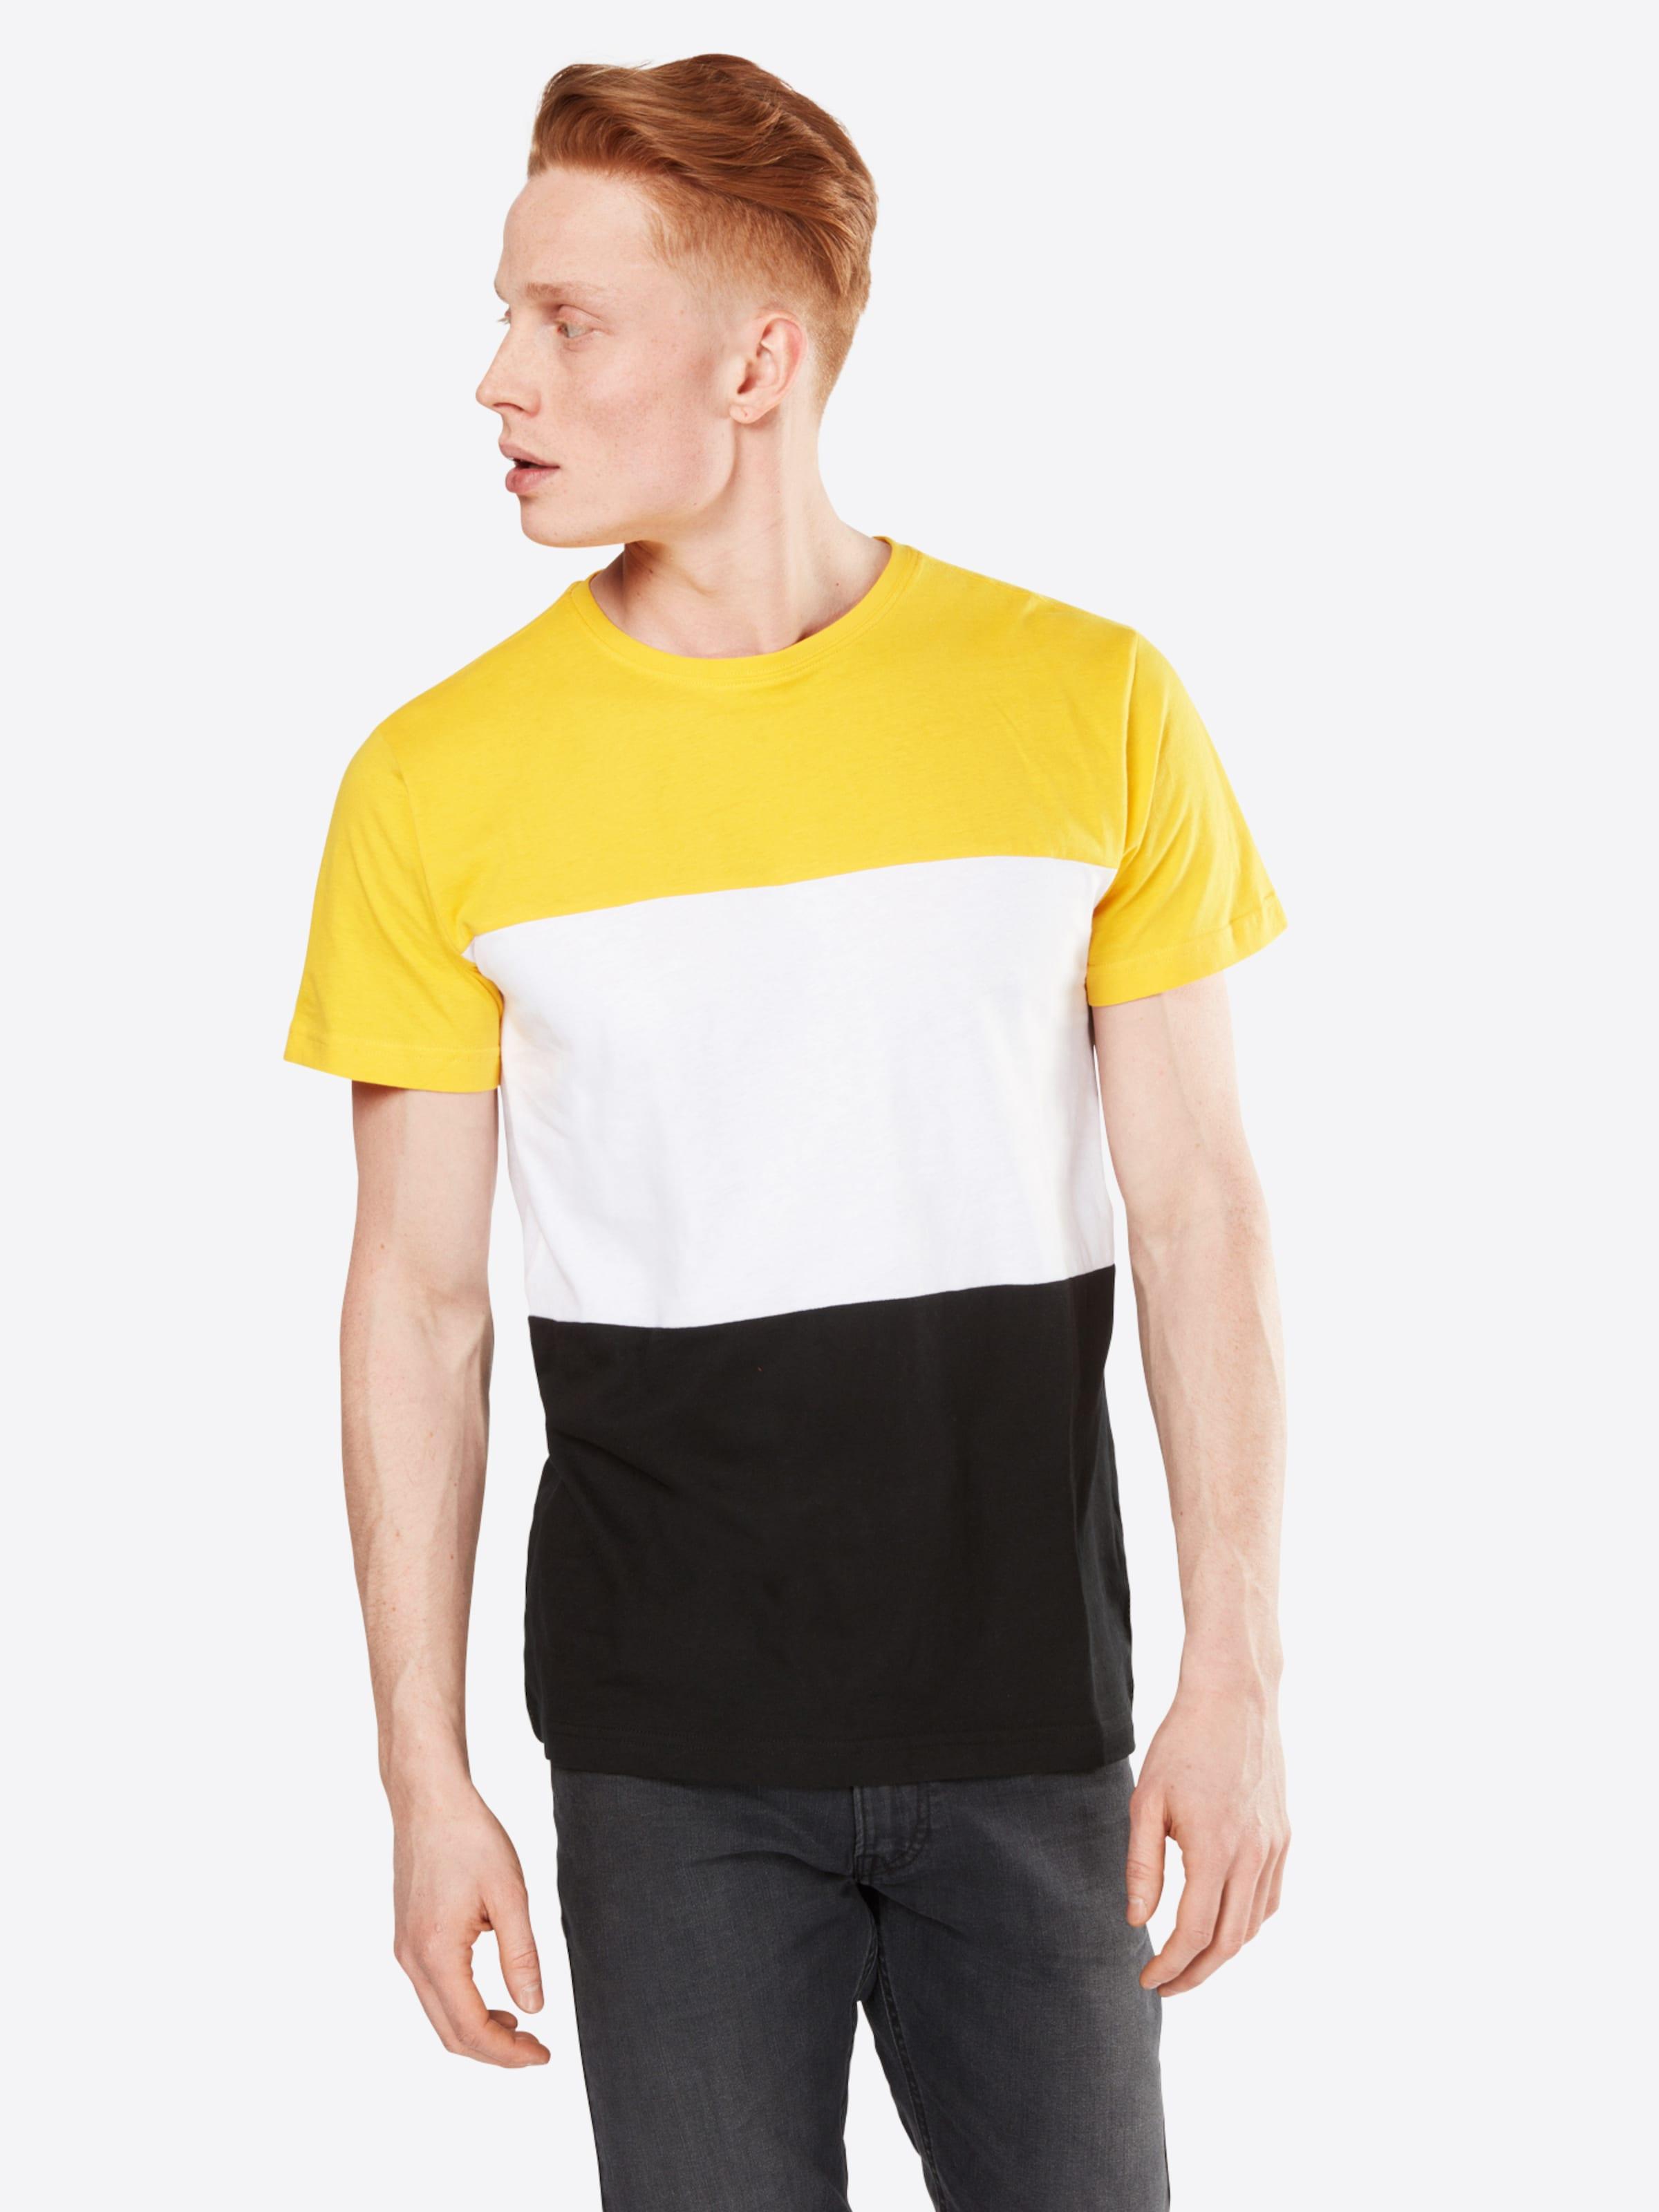 GelbSchwarz Classics In Weiß shirt Urban T bgmI7yvfY6